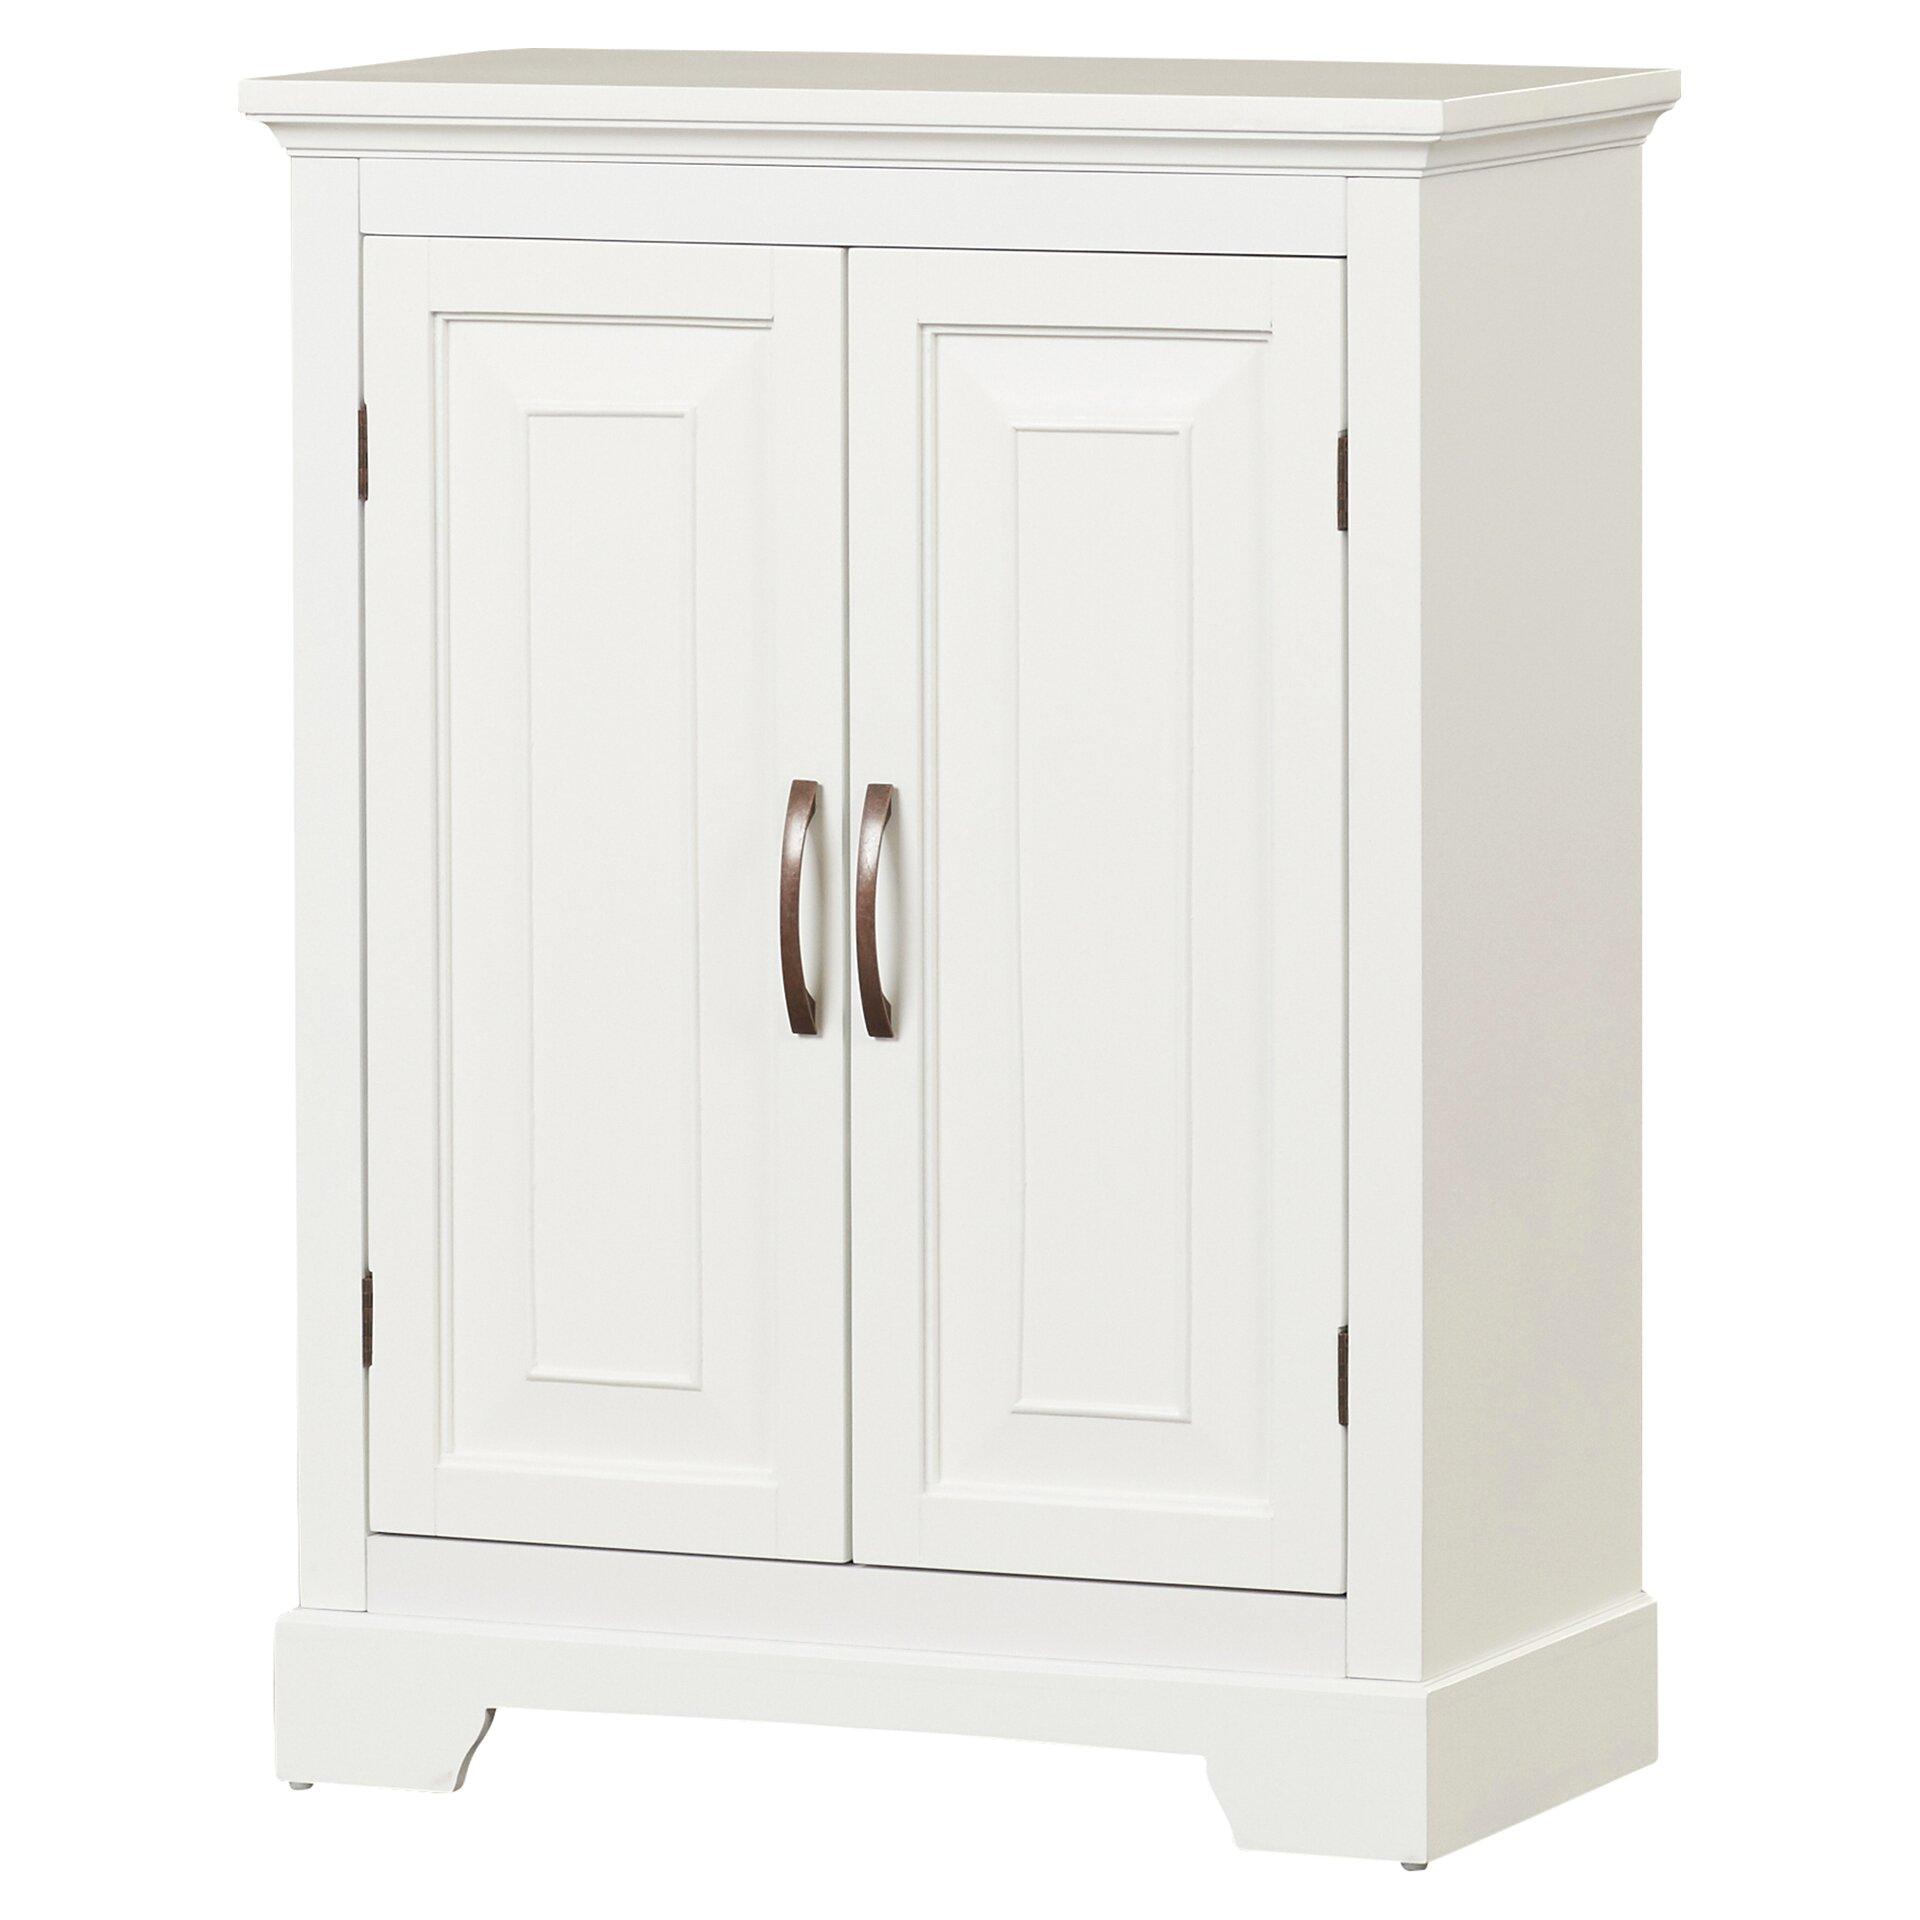 alcott hill prater 26 w x 32 h cabinet reviews. Black Bedroom Furniture Sets. Home Design Ideas